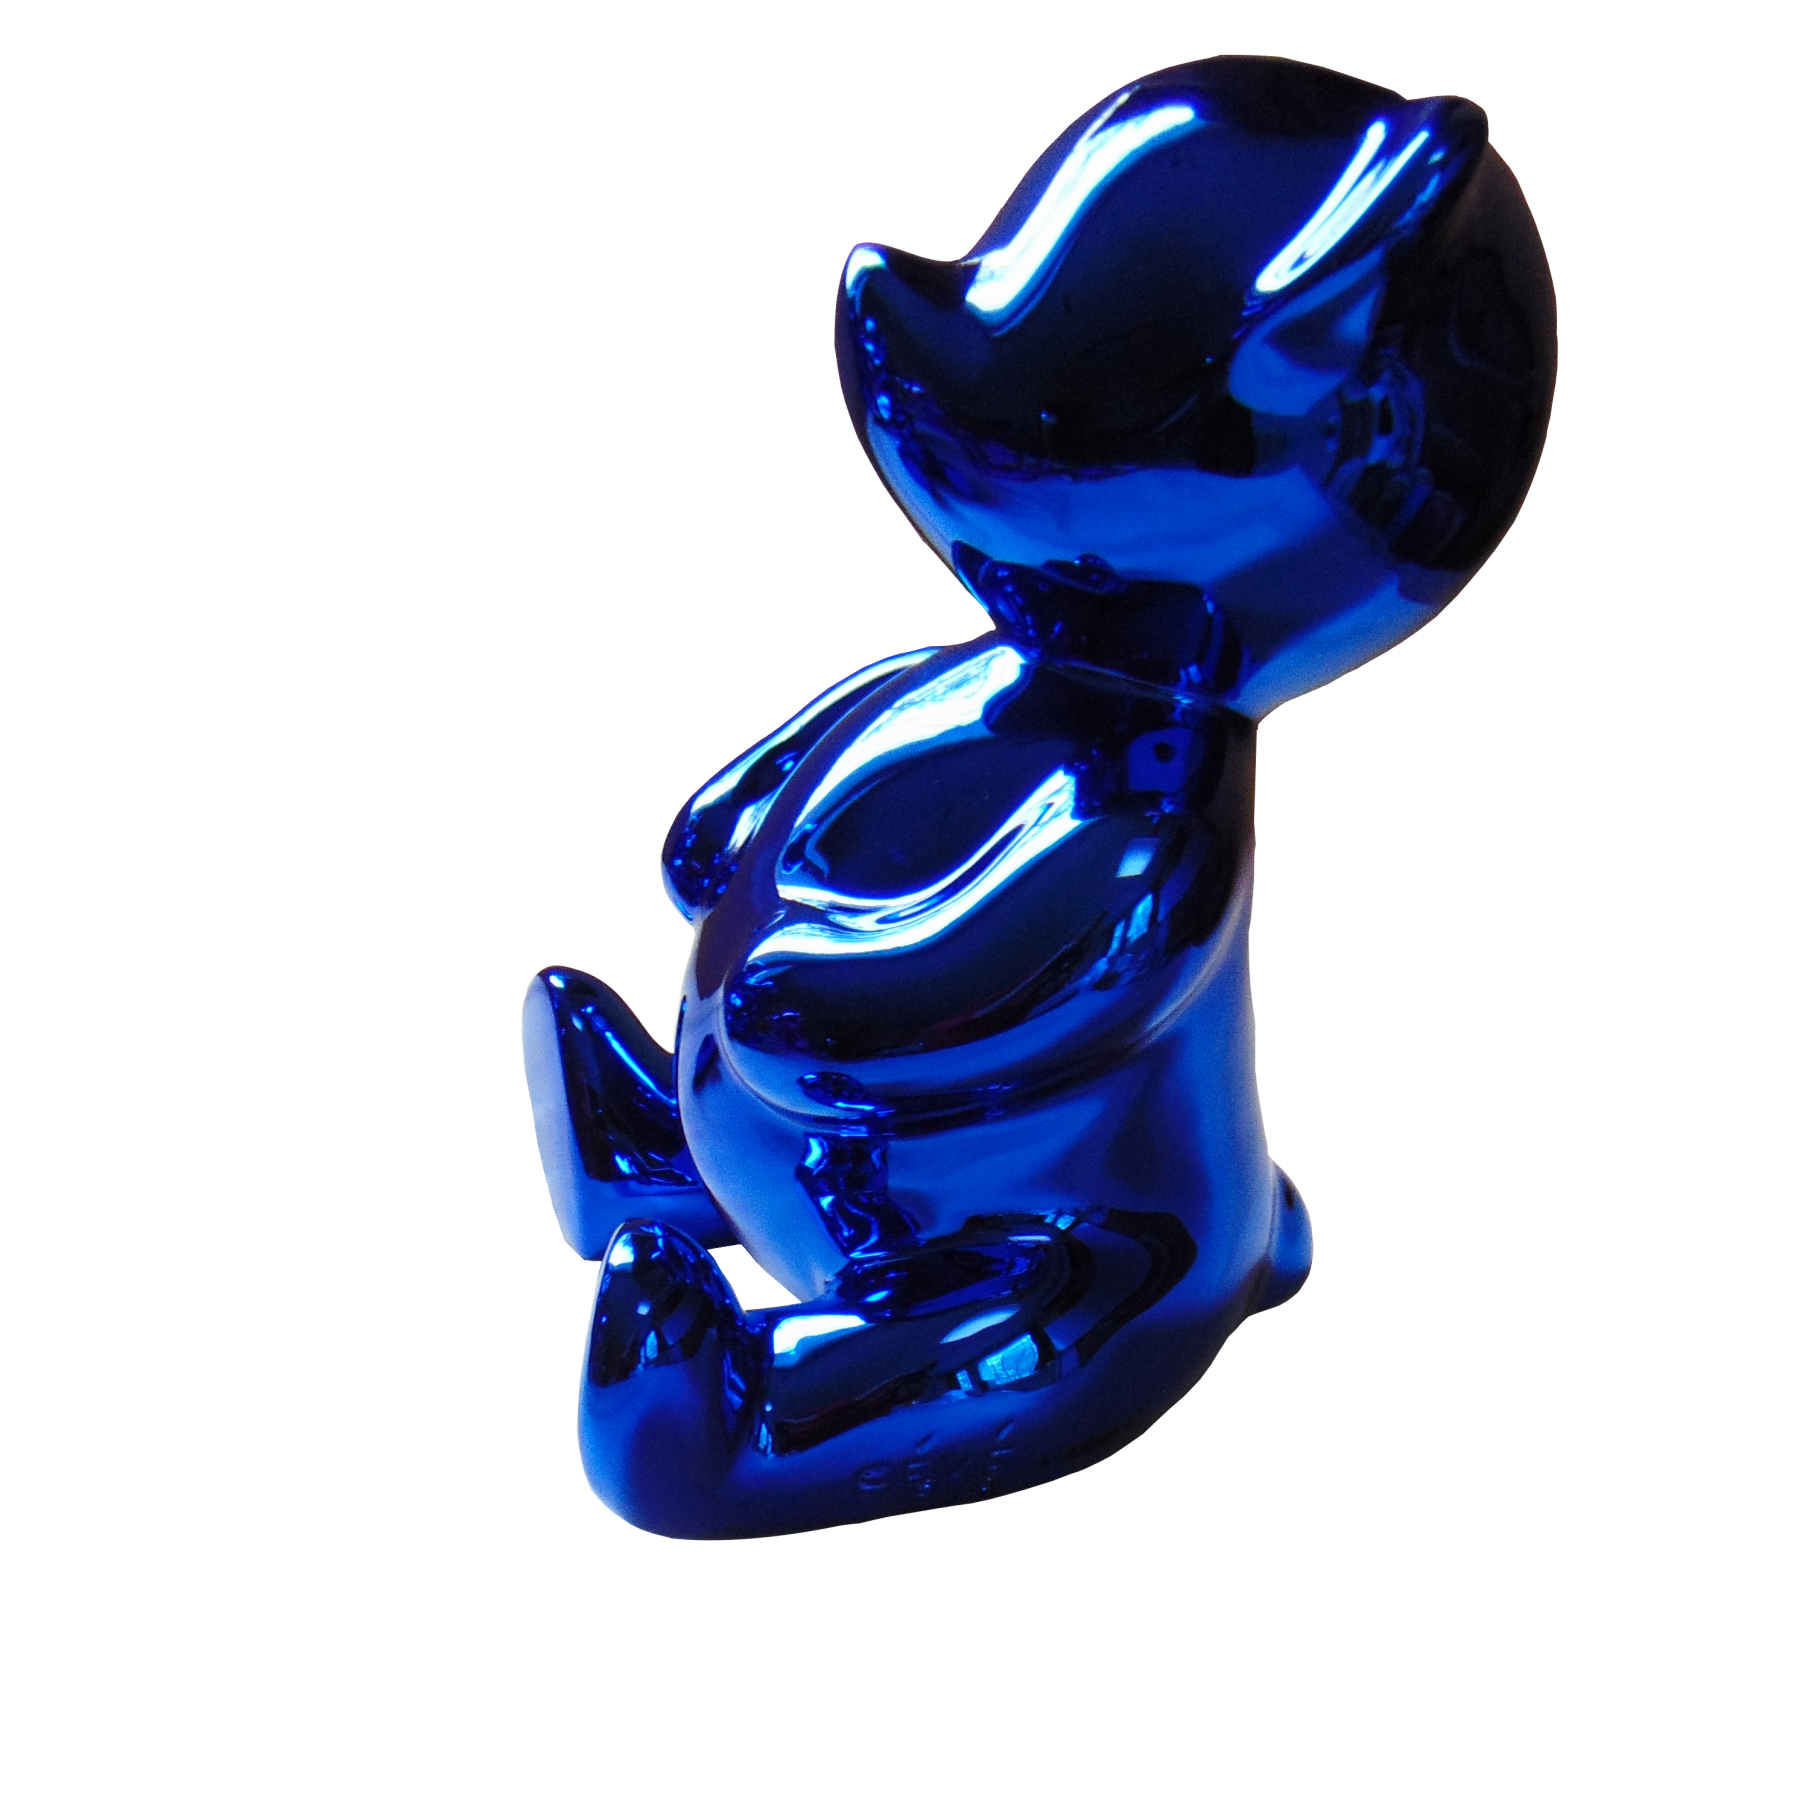 Chubby Blue by Cévé at Hg Contemporary art gallery